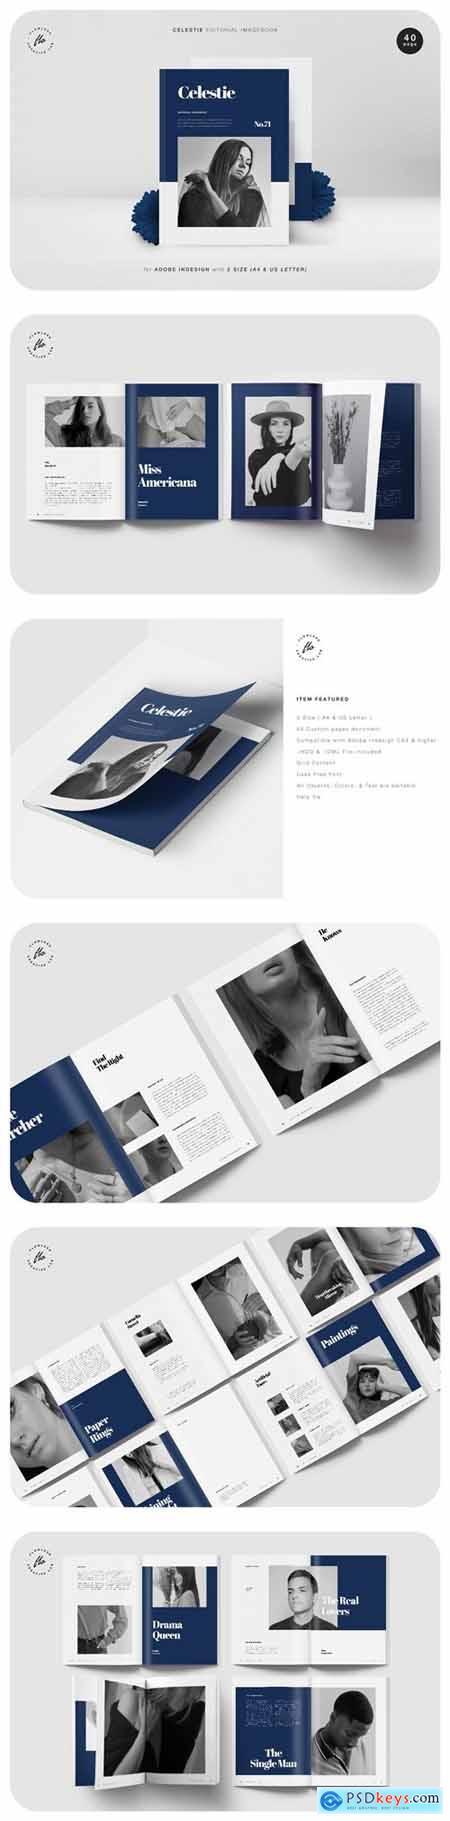 Celestie Editorial Imagebook